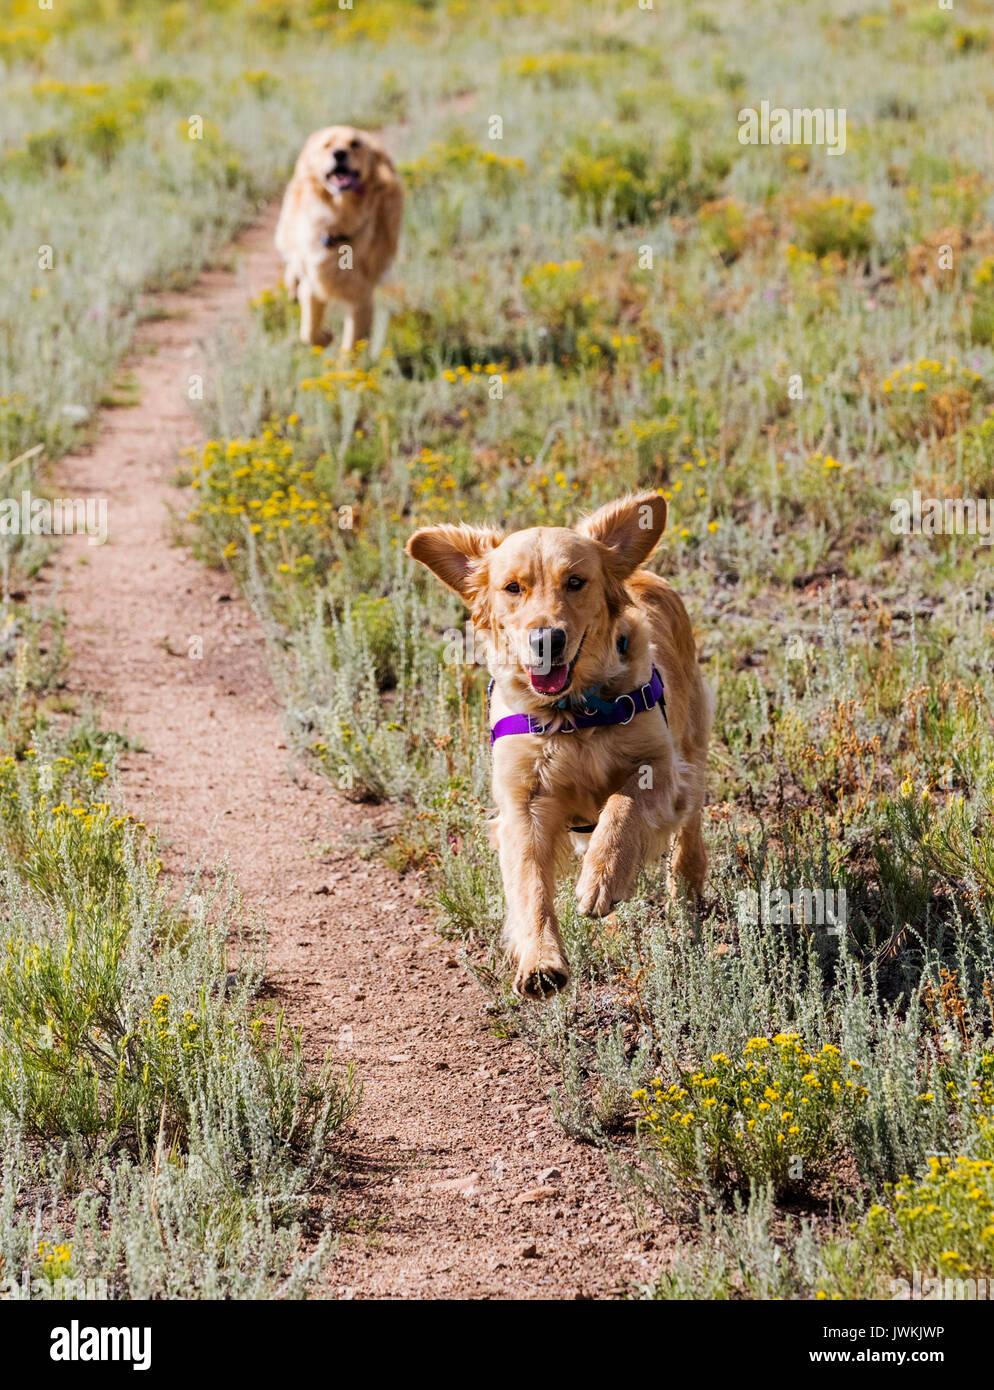 Golden Retriever dogs running in a field - Stock Image